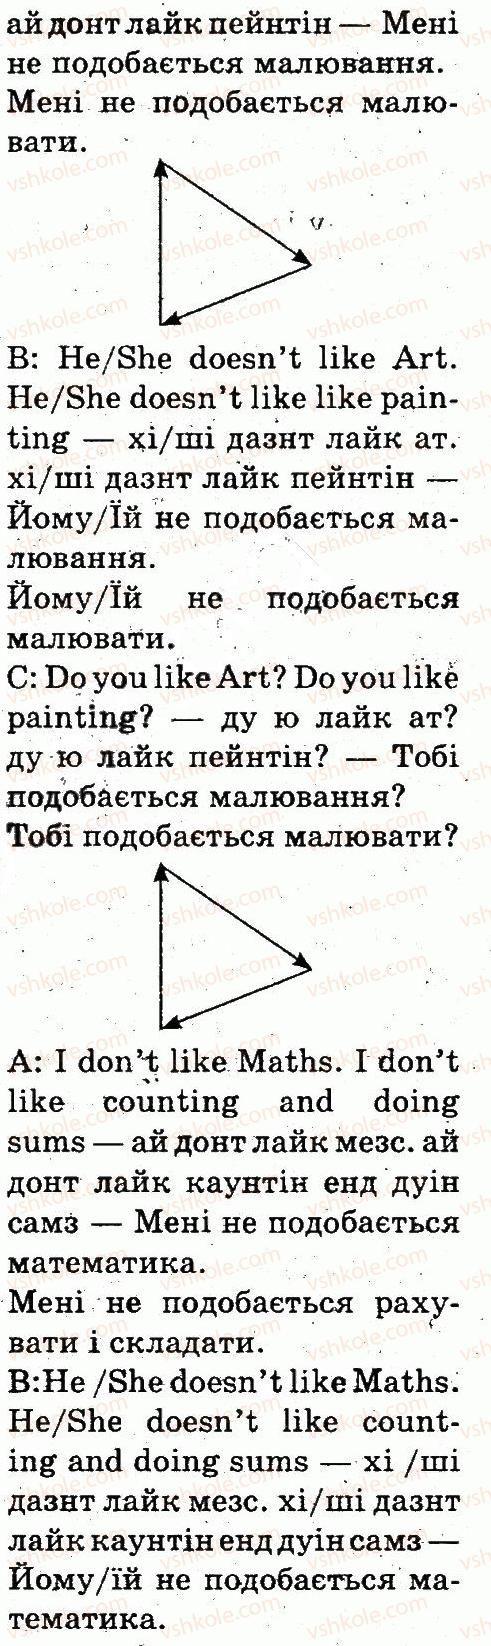 3-anglijska-mova-od-karpyuk-2013--unit-3-welcome-back-to-school-lesson-4-2-rnd5950.jpg